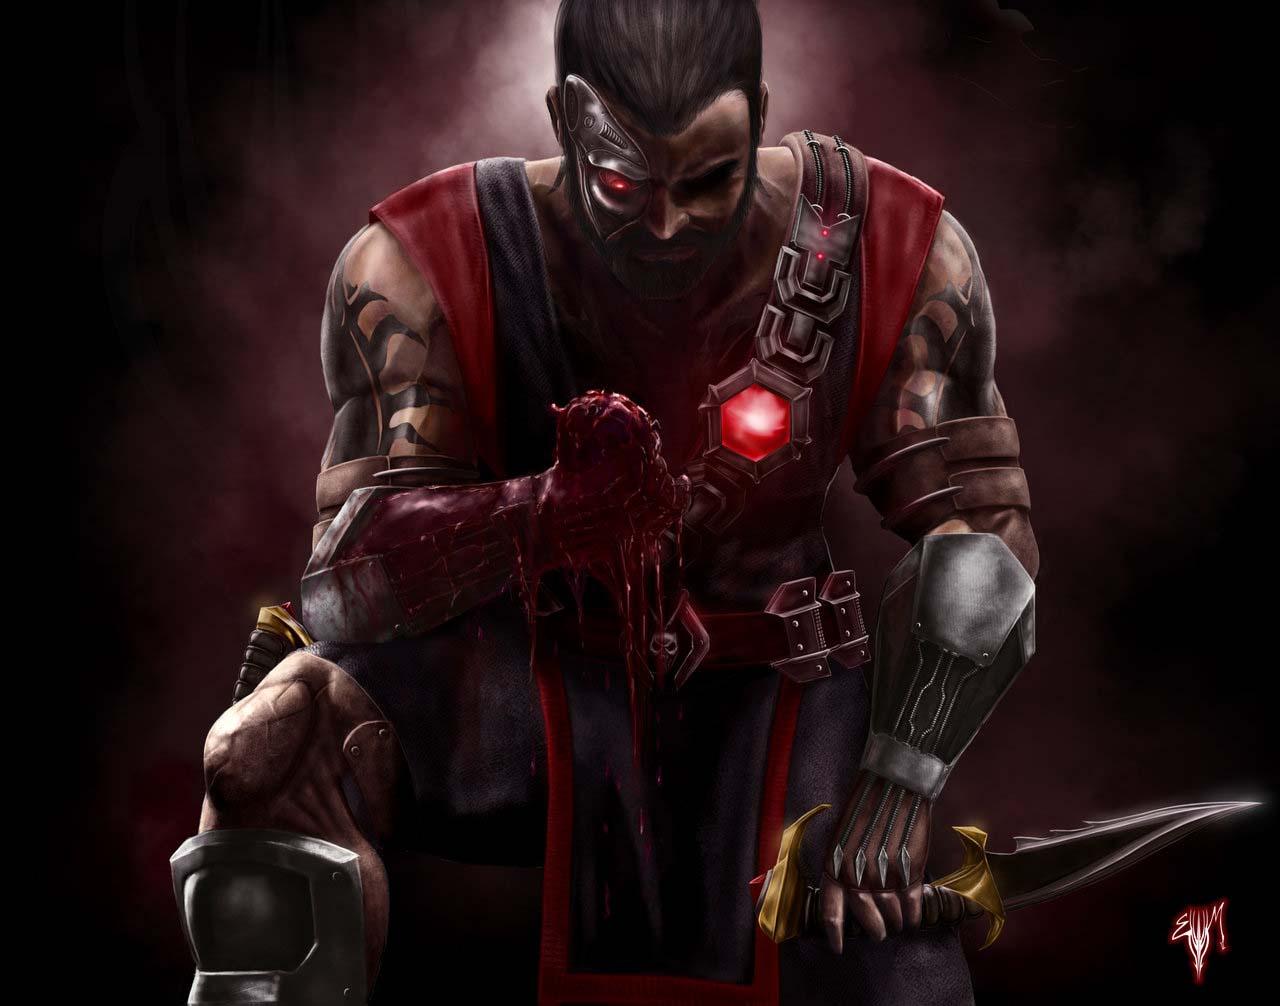 Mortal Kombat kano art